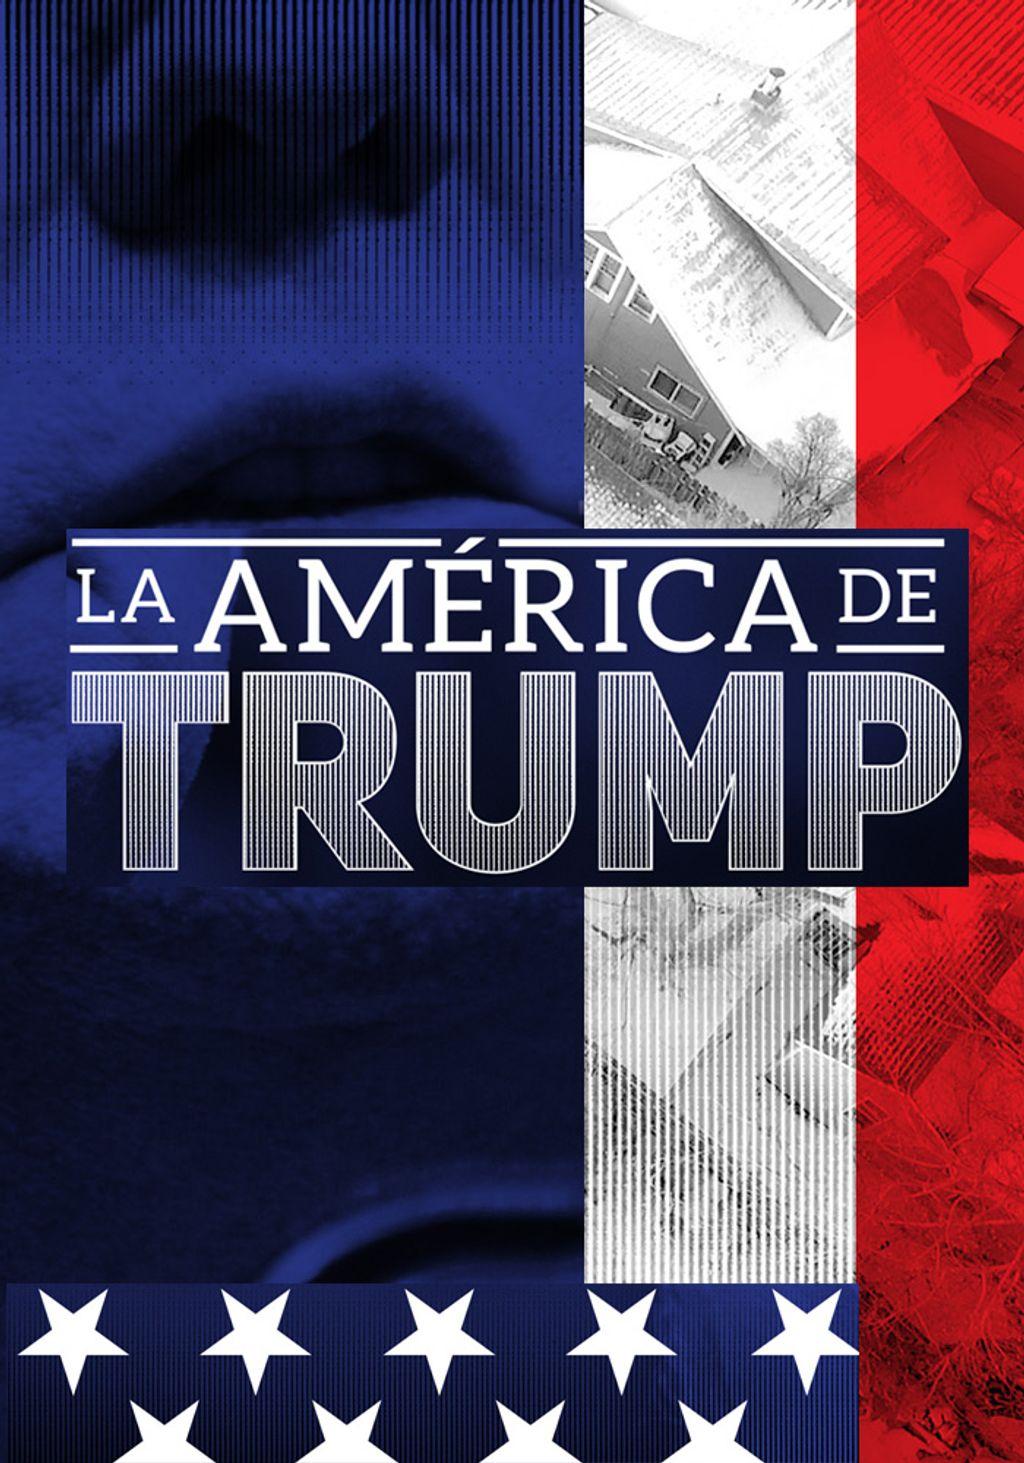 umy2hhdzsawb_laamericadetrump_poster.jpg